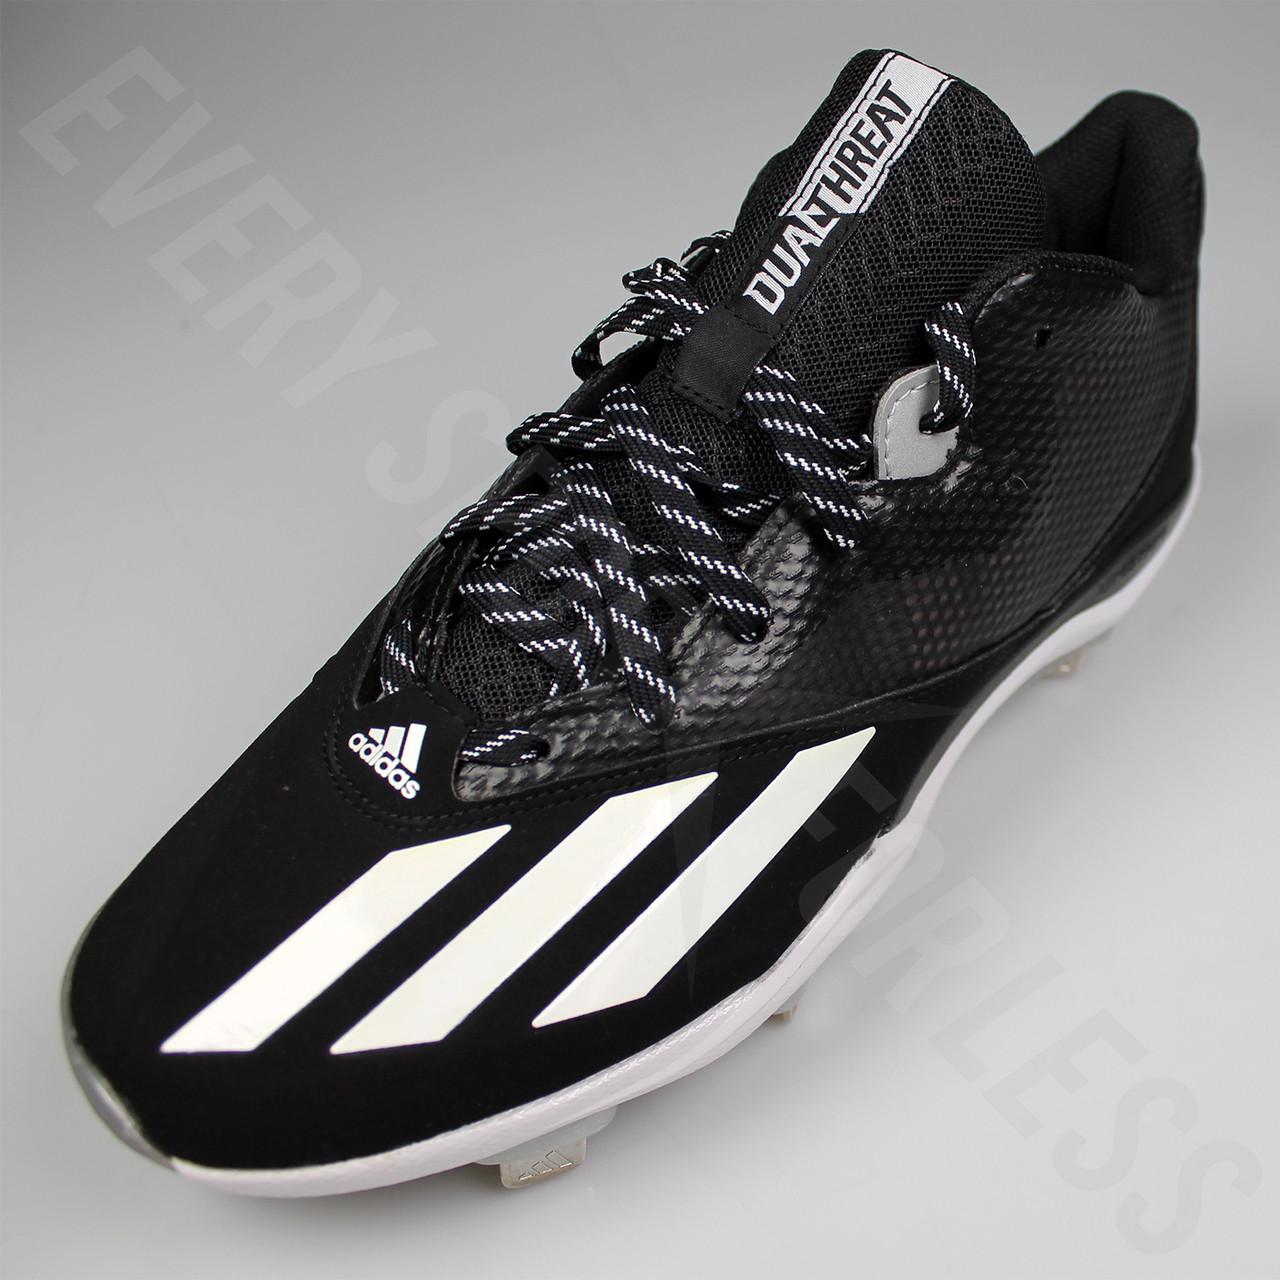 hot sale online 7b62d 79378 ... Adidas Dual Threat 2 Mens Baseball Cleats F37751 - Black, White, Silver  ...